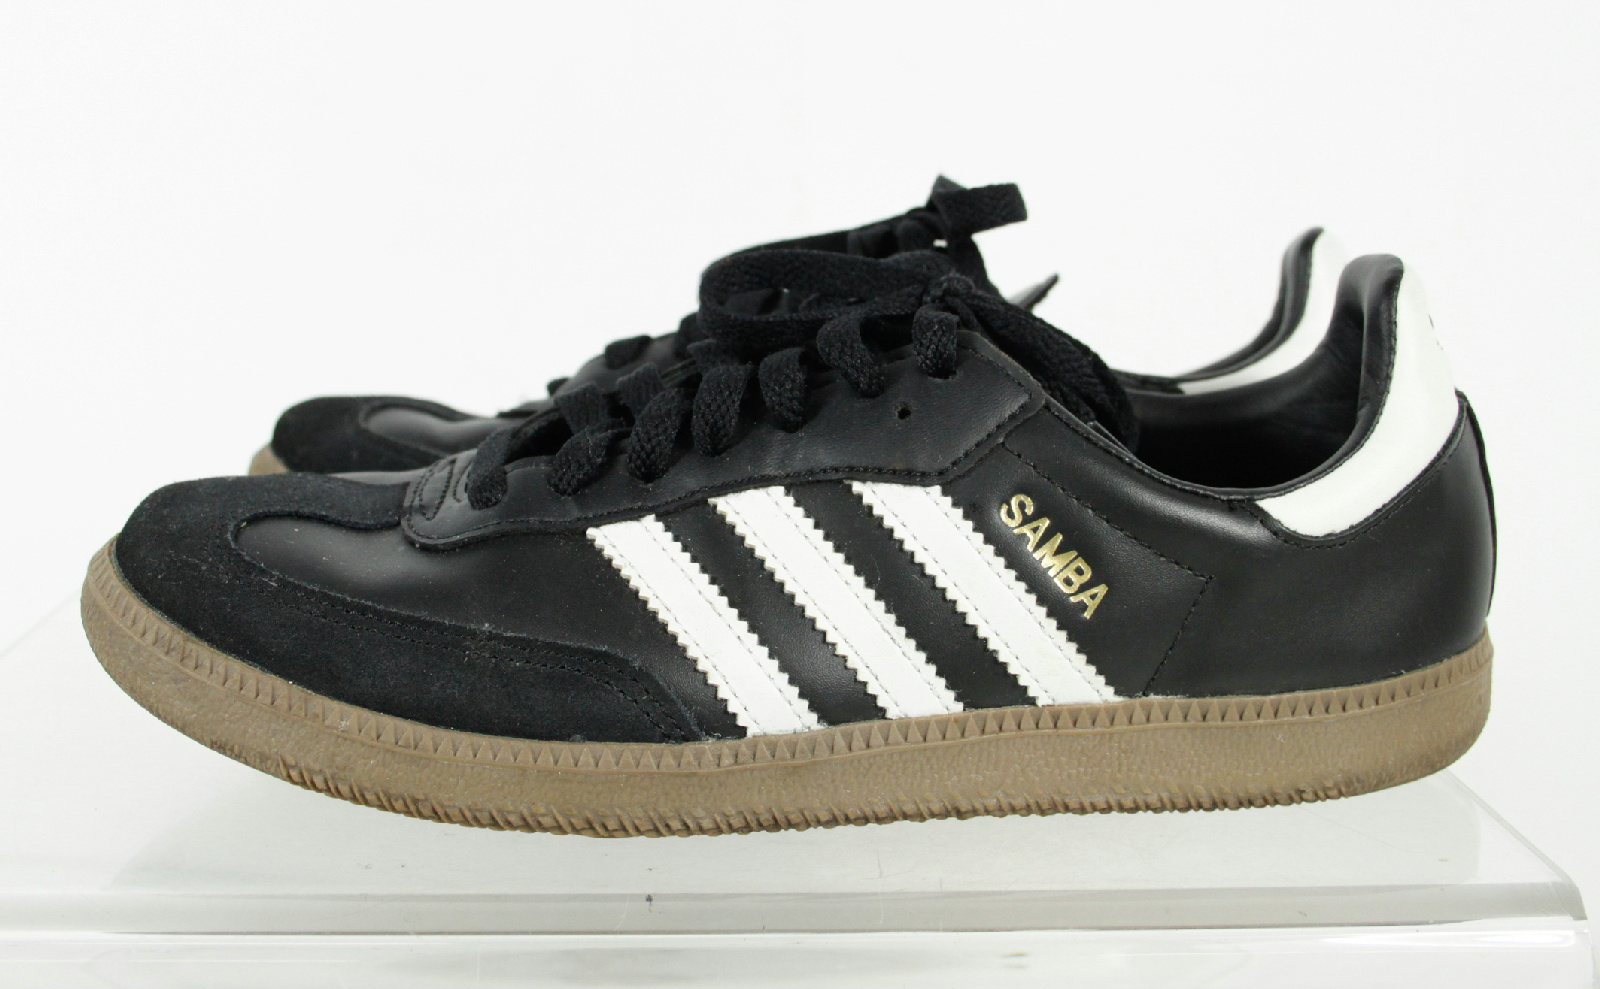 adidas samba black 3 stripes lace low cut casual sneakers